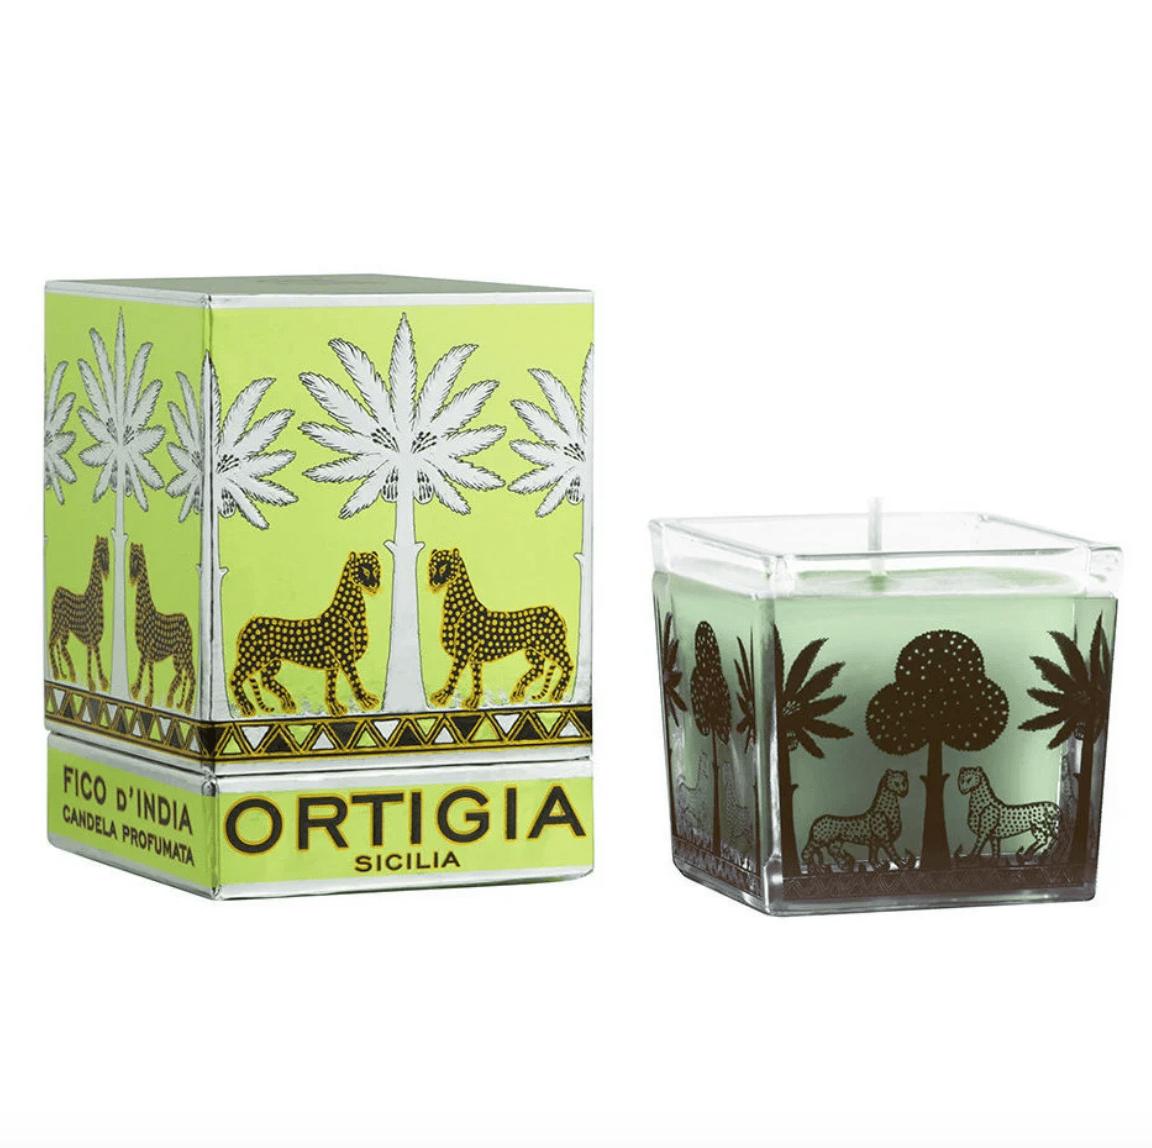 Image of Ortigia Candle (multiple scents)